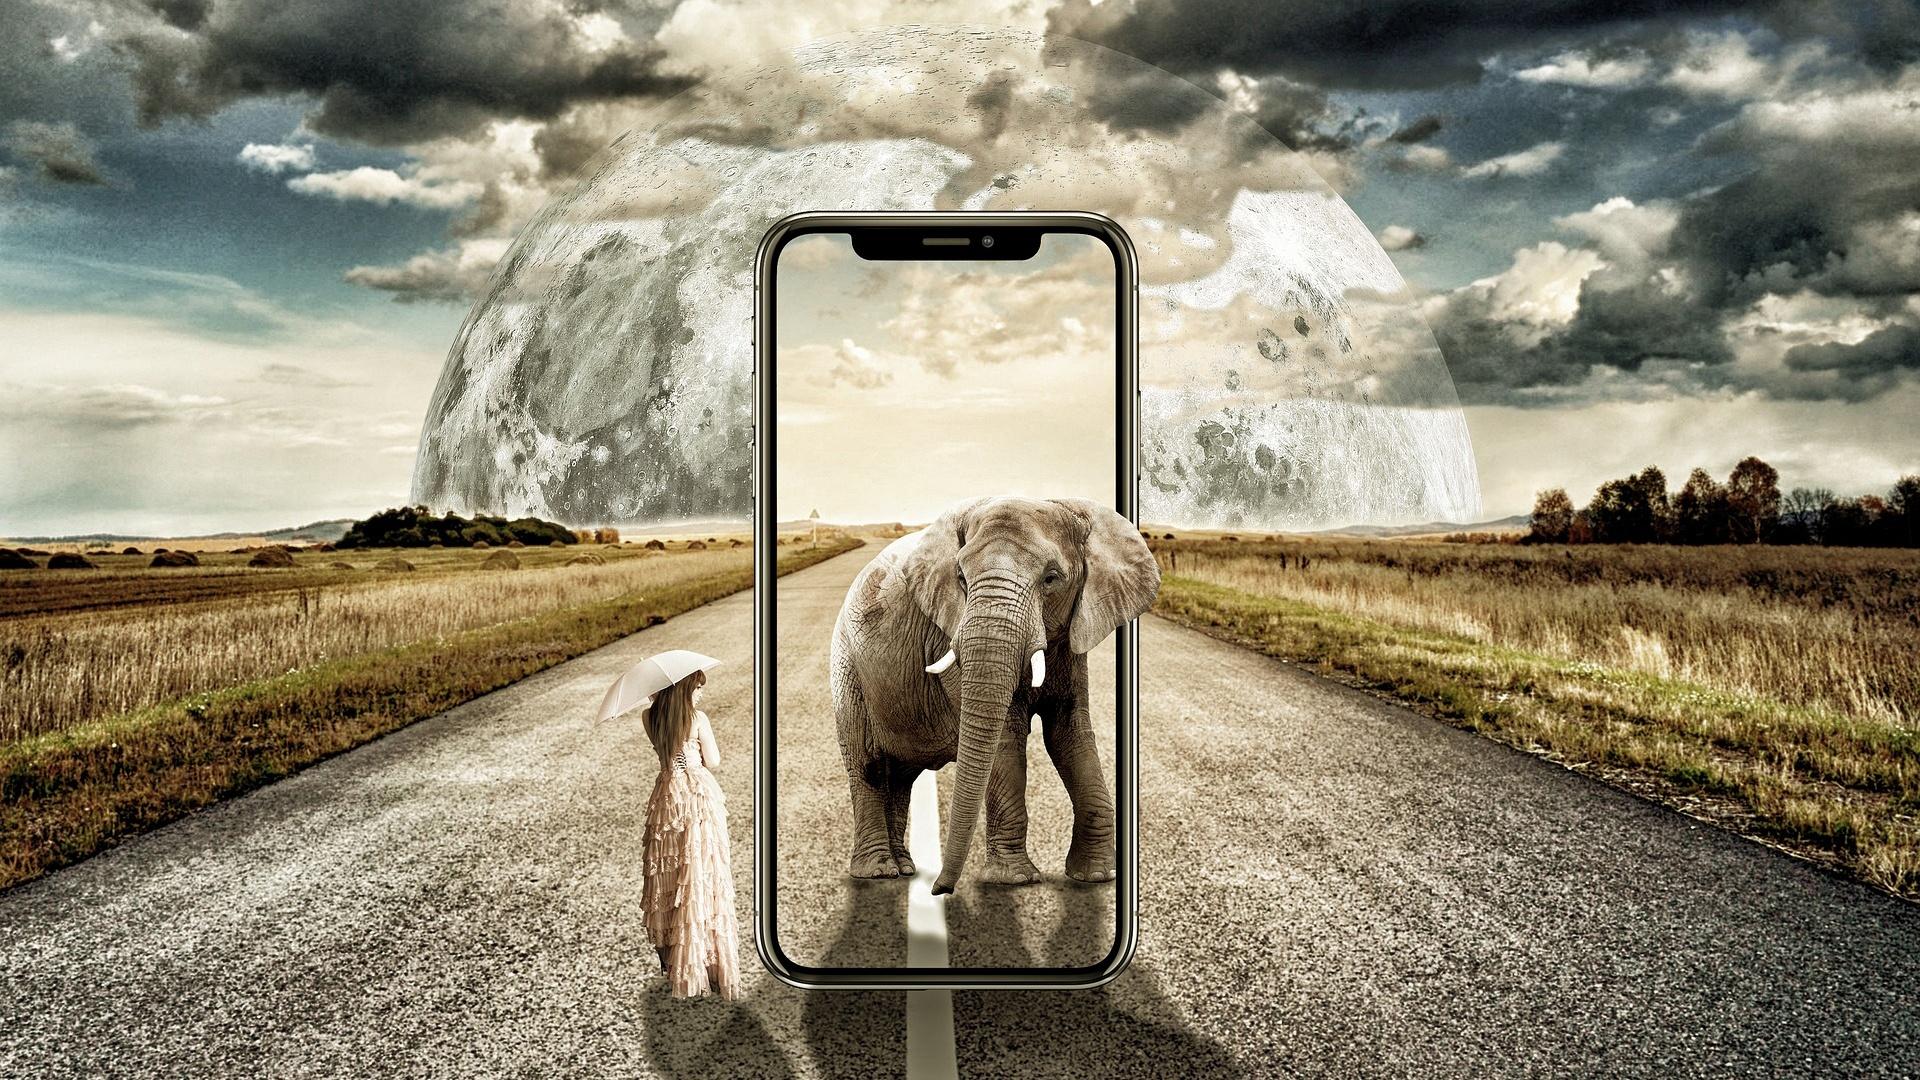 Introduce modern technology platforms